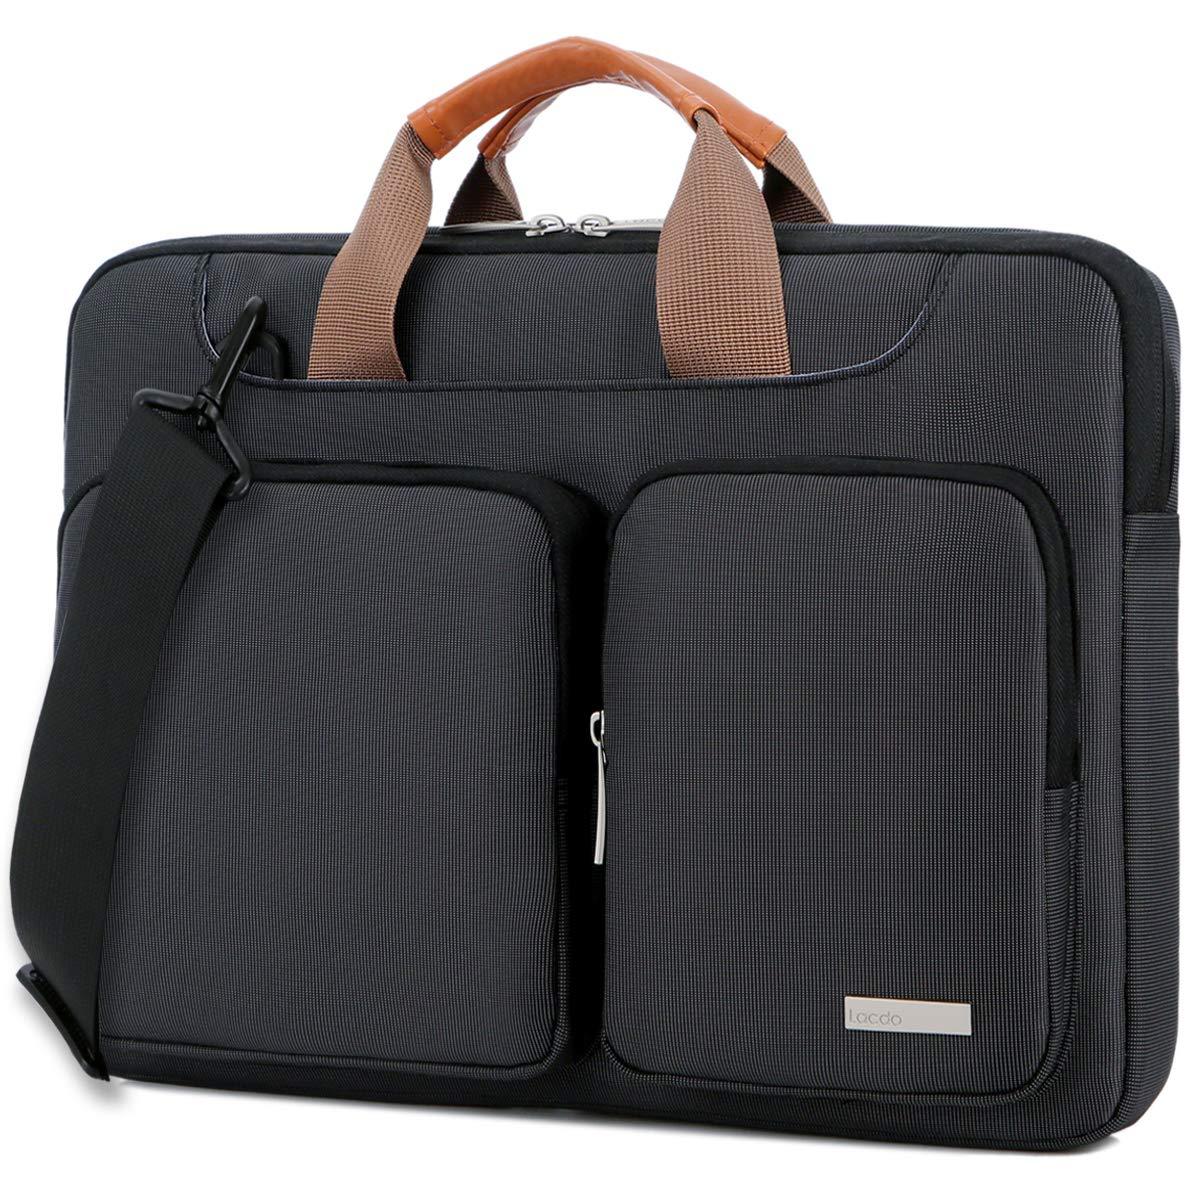 Lacdo 15.6 Inch Laptop Shoulder Bag, 360° Protective Sleeve Case Compatible Acer Aspire, Predator, Toshiba, Inspiron, ASUS P-Series, HP Pavilion, Lenovo, Chromebook Notebook Briefcases, Black